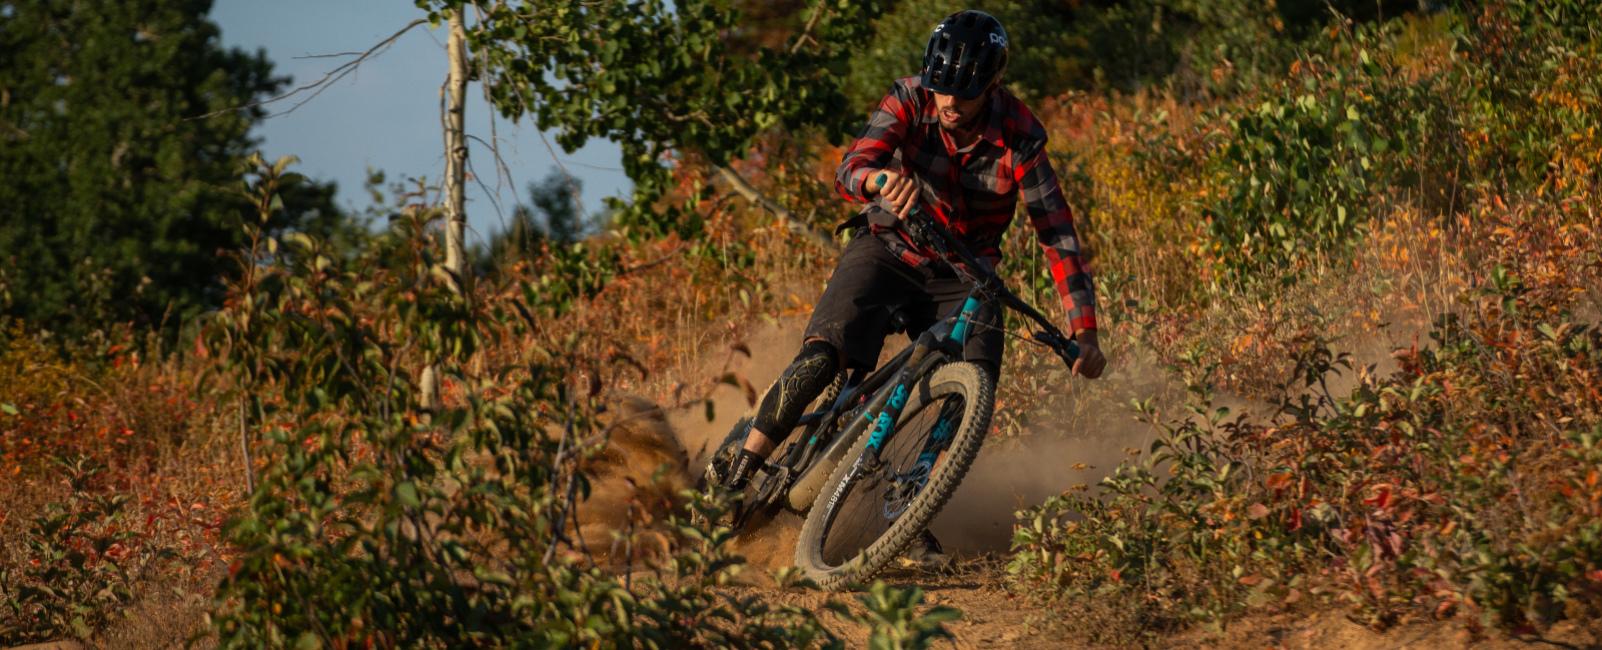 Mountain Biking The 3 Ogden Valley Resorts in A Day